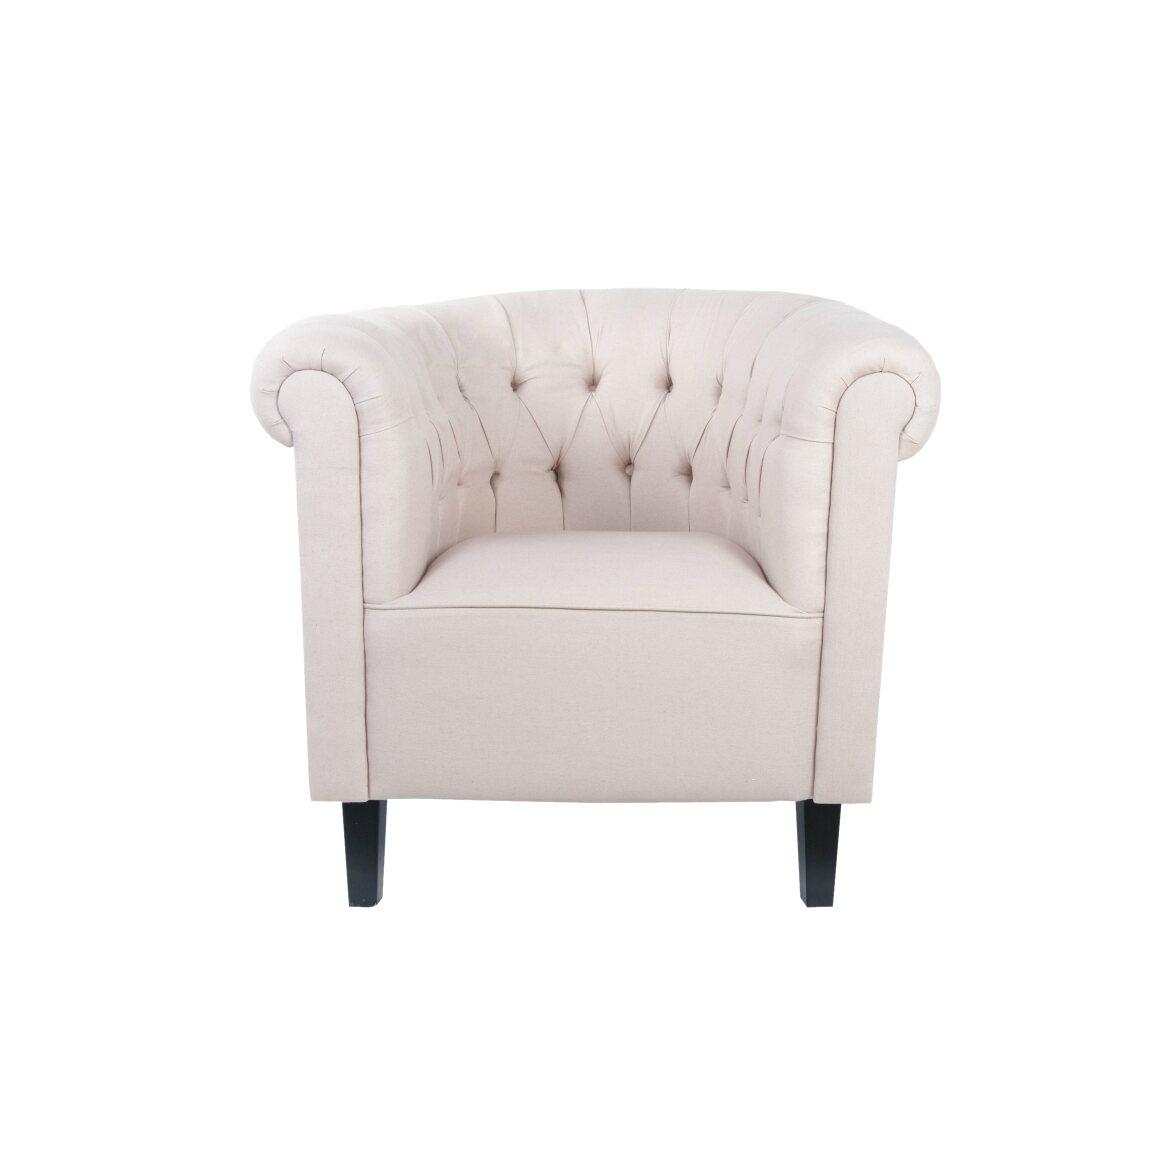 Кресло Swaun beige | Маленькие кресла Kingsby